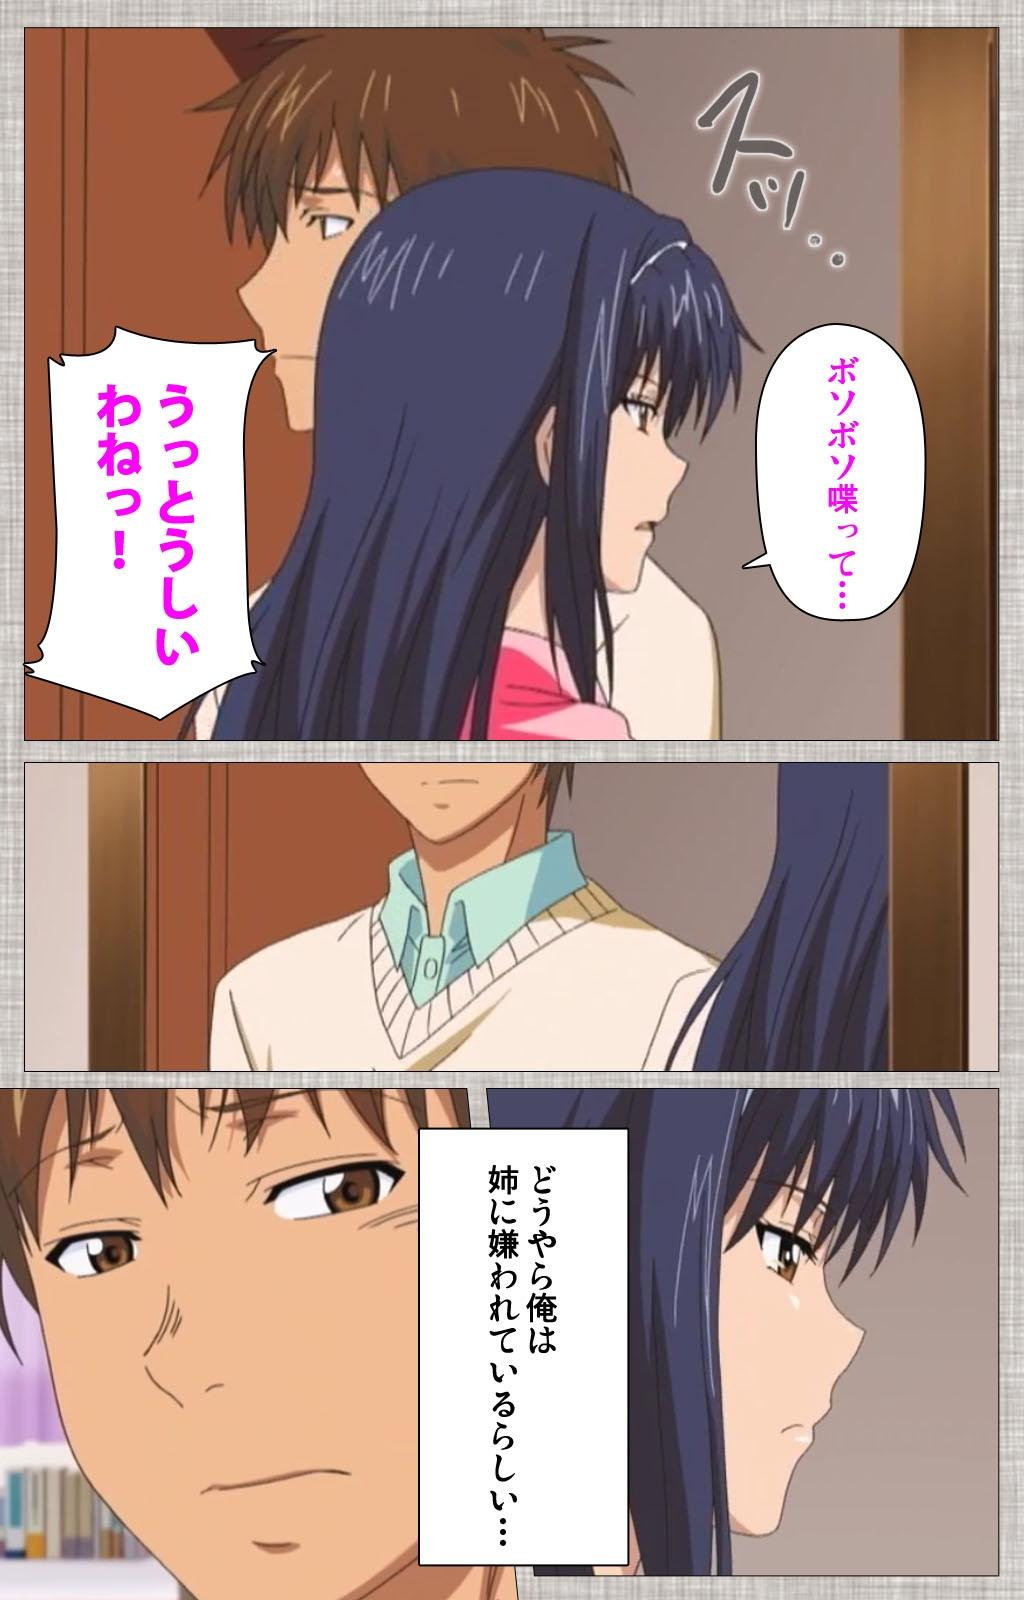 Ane-Koi #1 Complete Ban 7